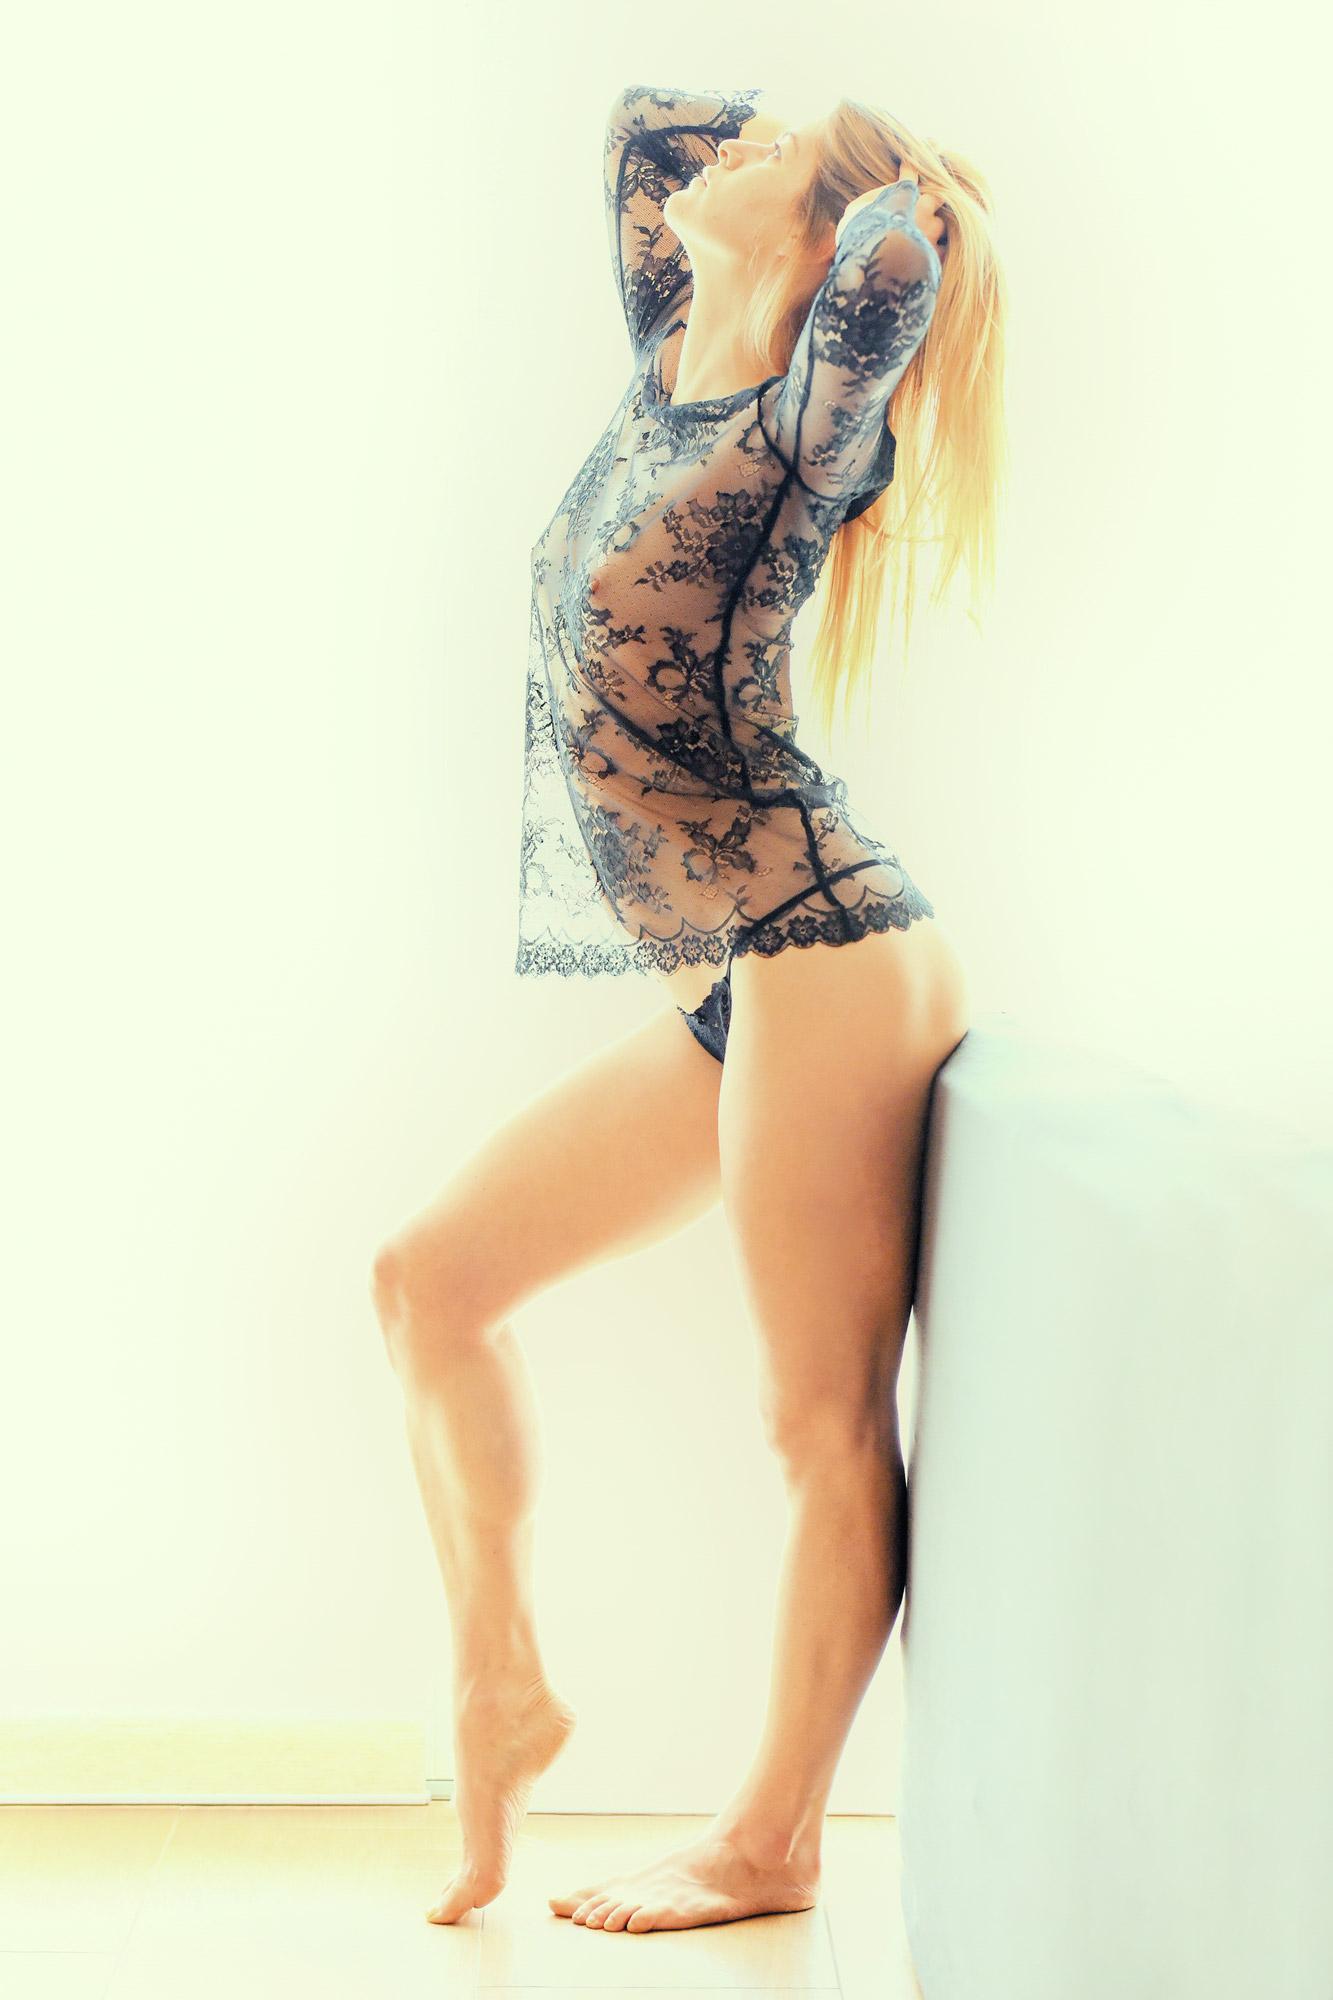 #boudoir #fotoboudoir #gralour #modelle